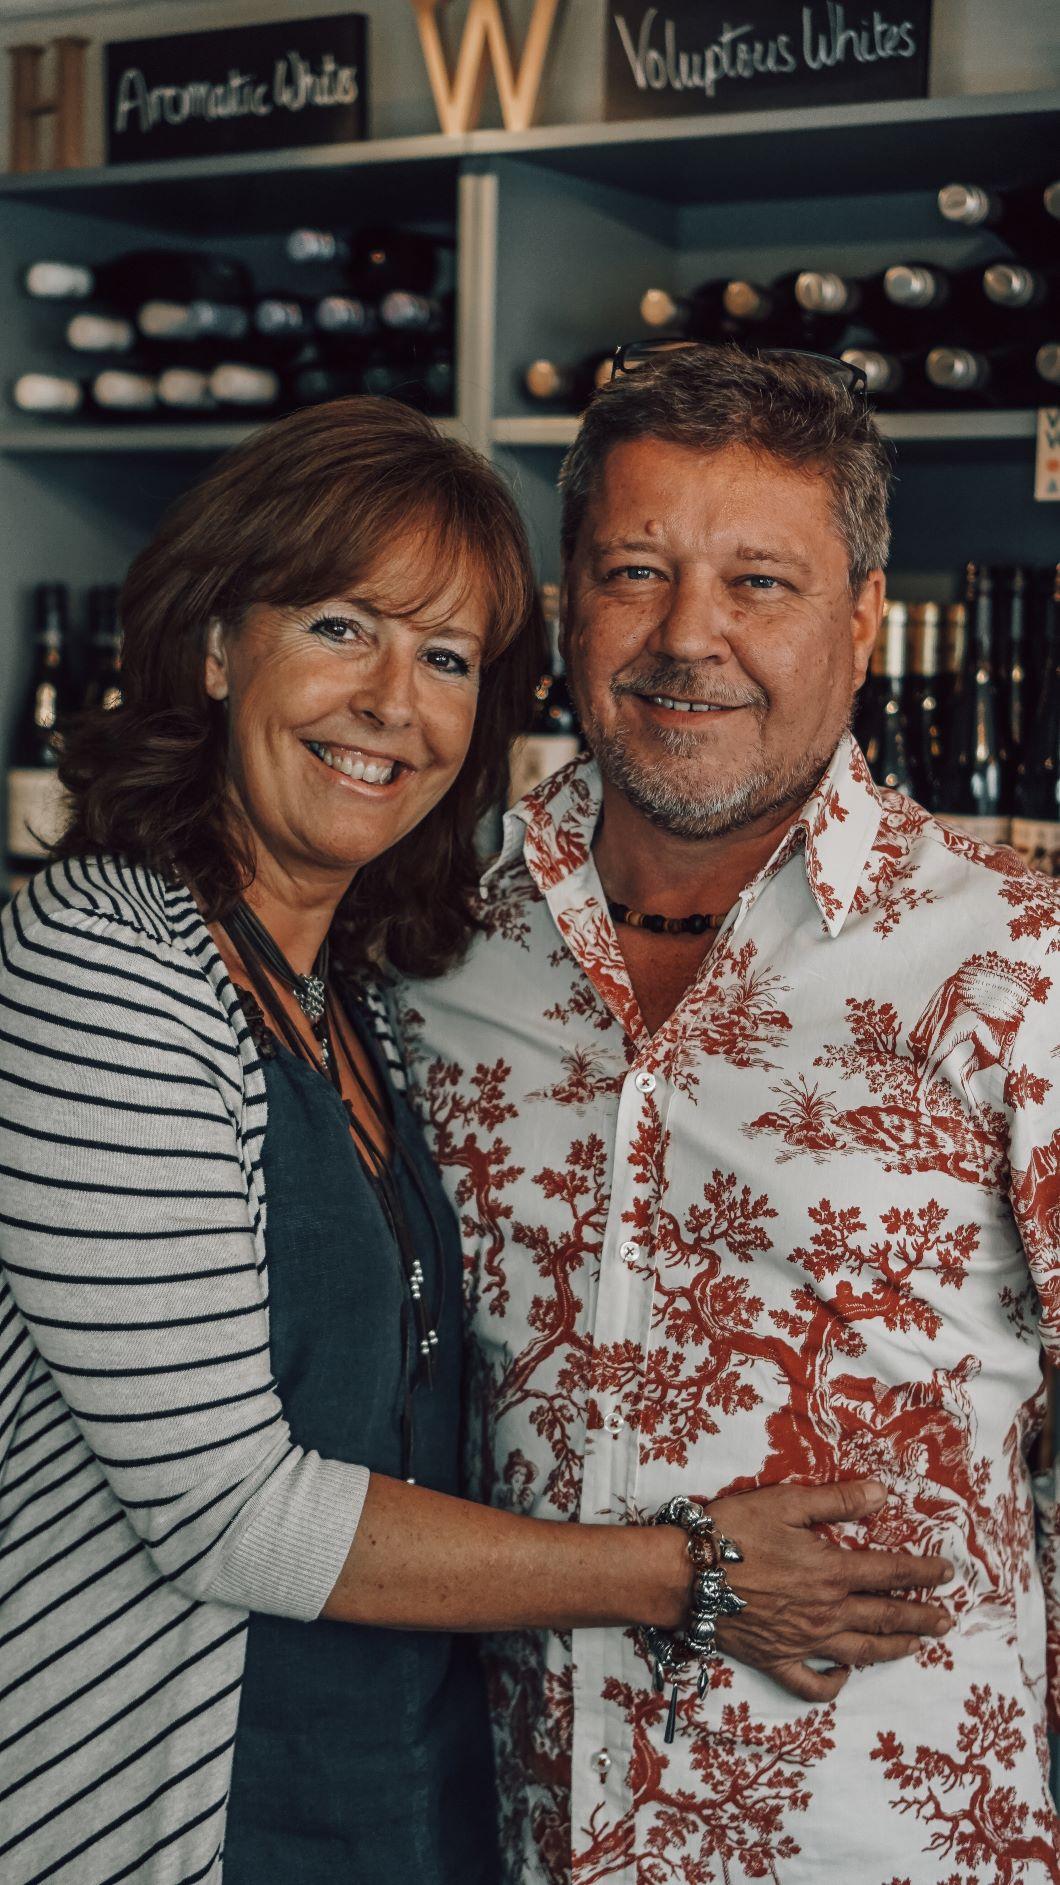 Wine Merchant 'Toasts' To First Anniversary Success Despite Covid-19